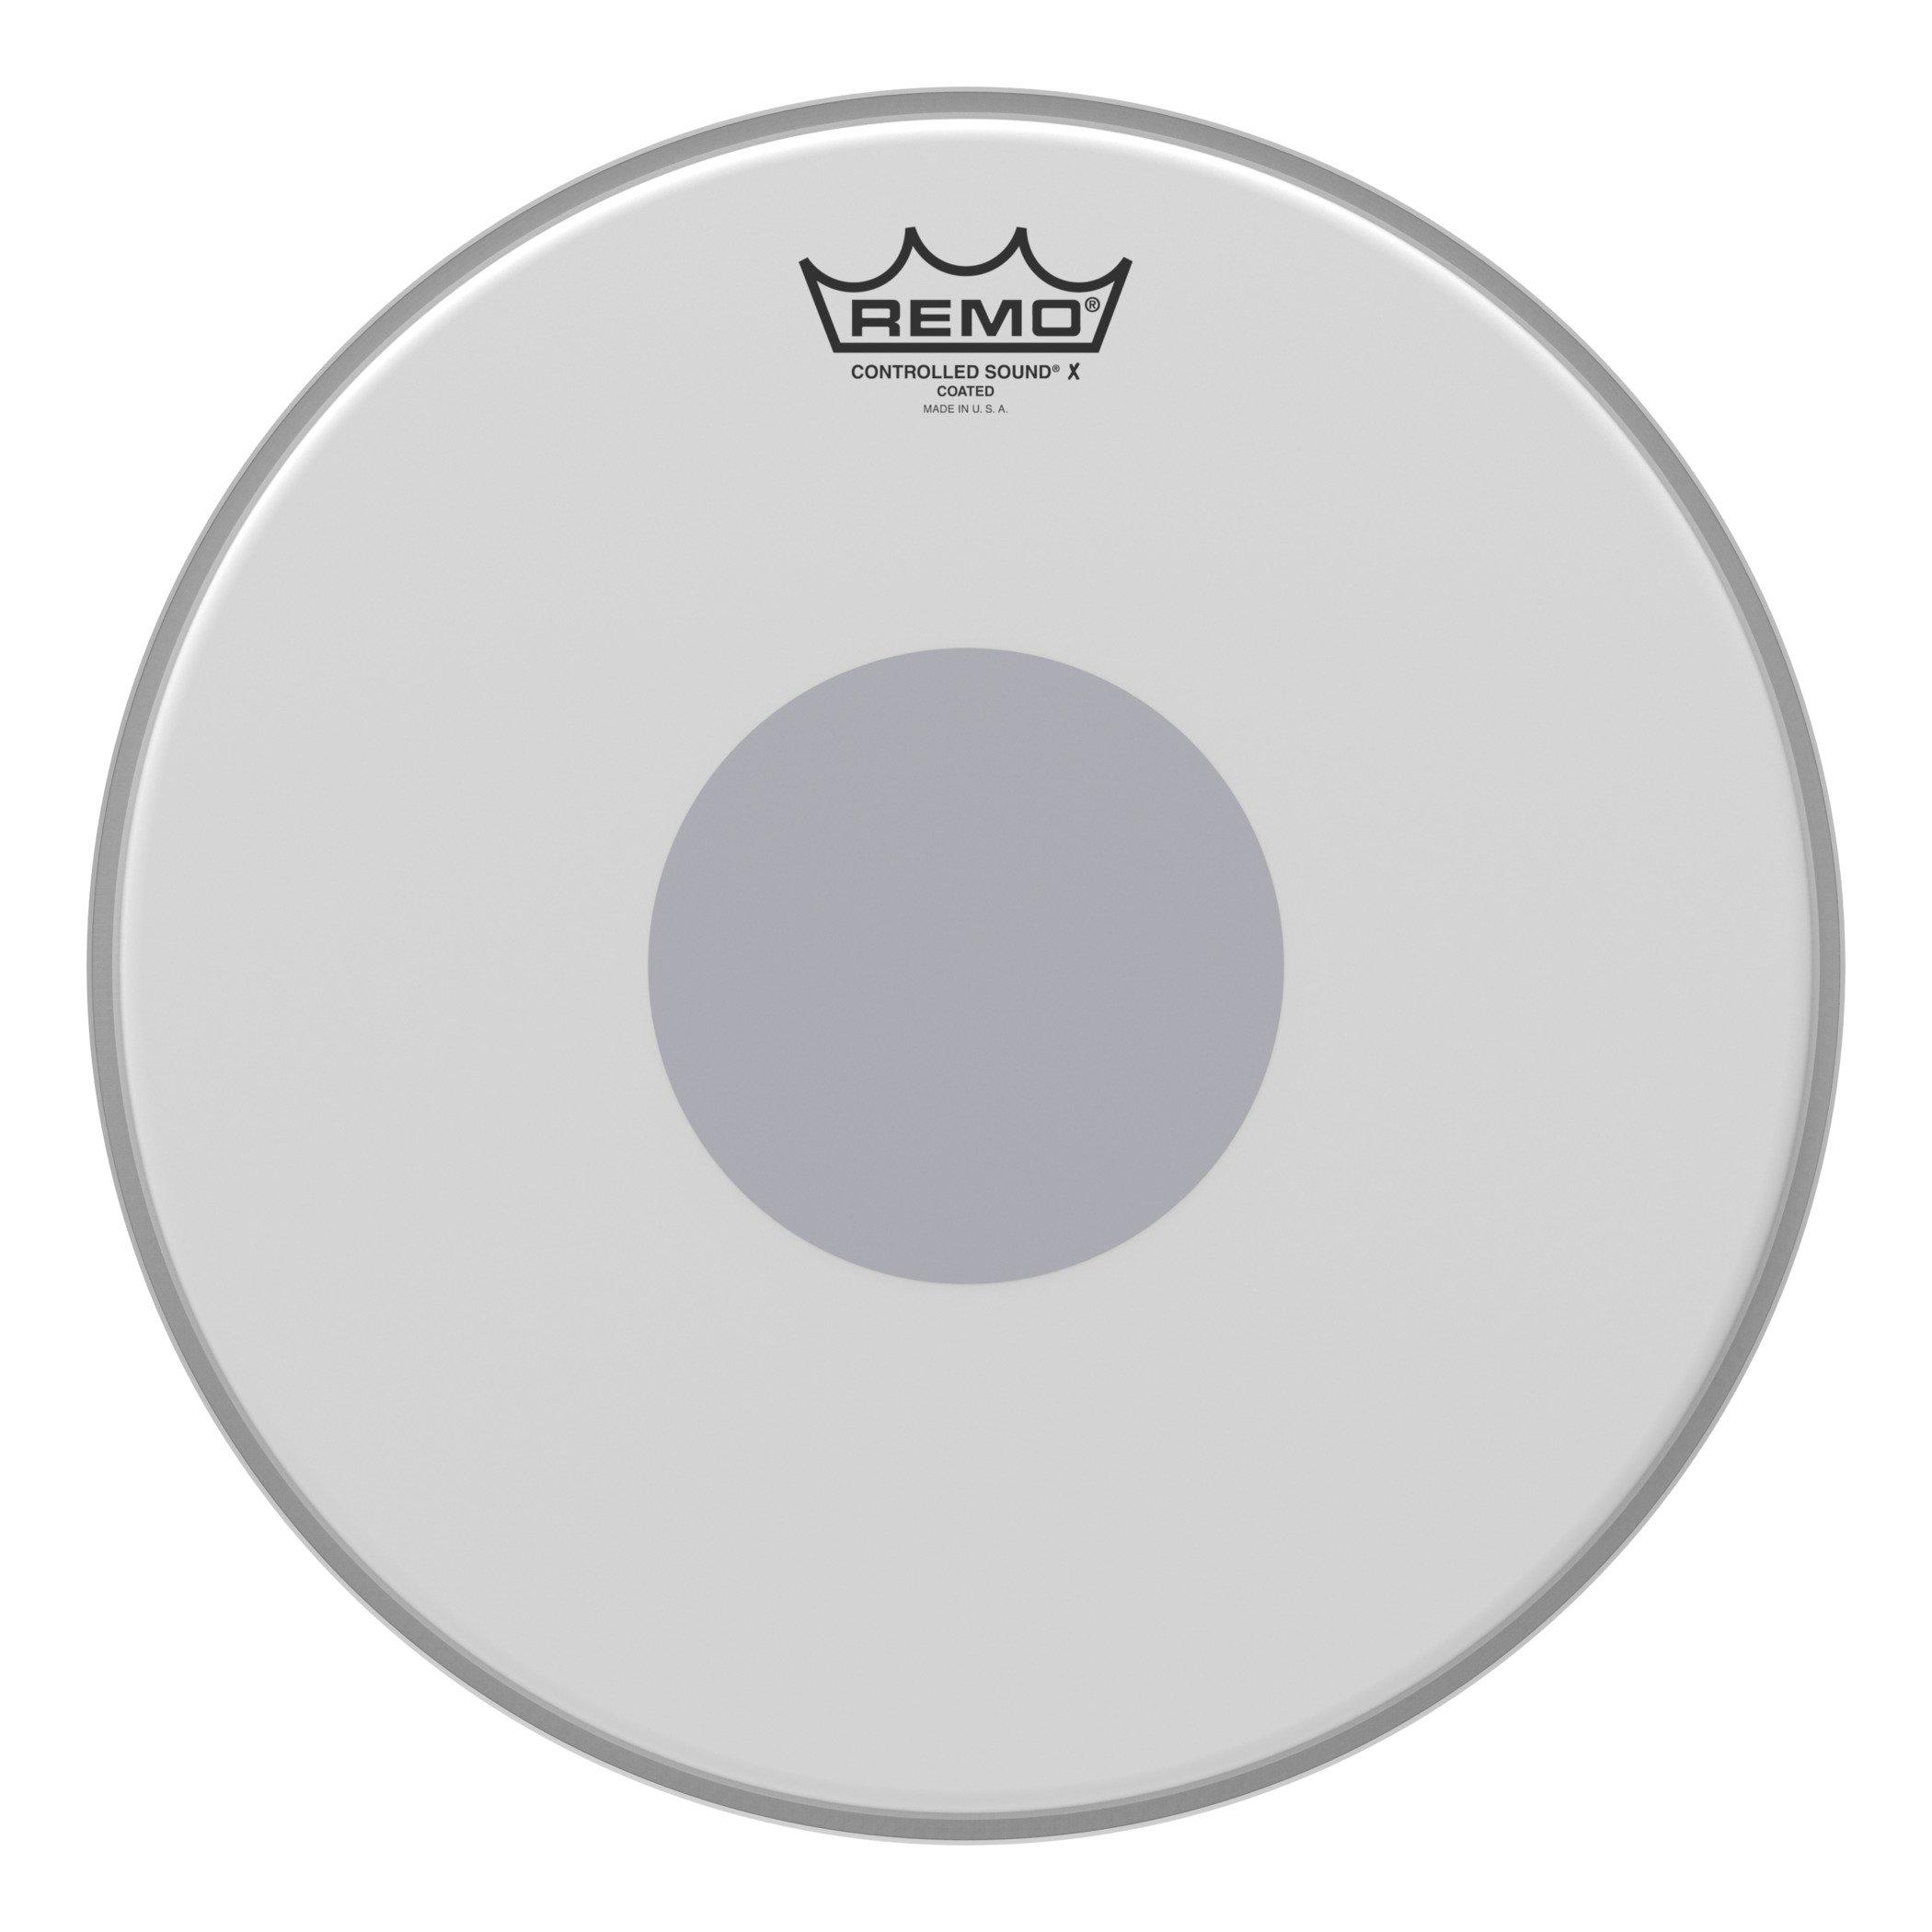 Remo Drum Set, 13'' (CX0113-10) by Remo